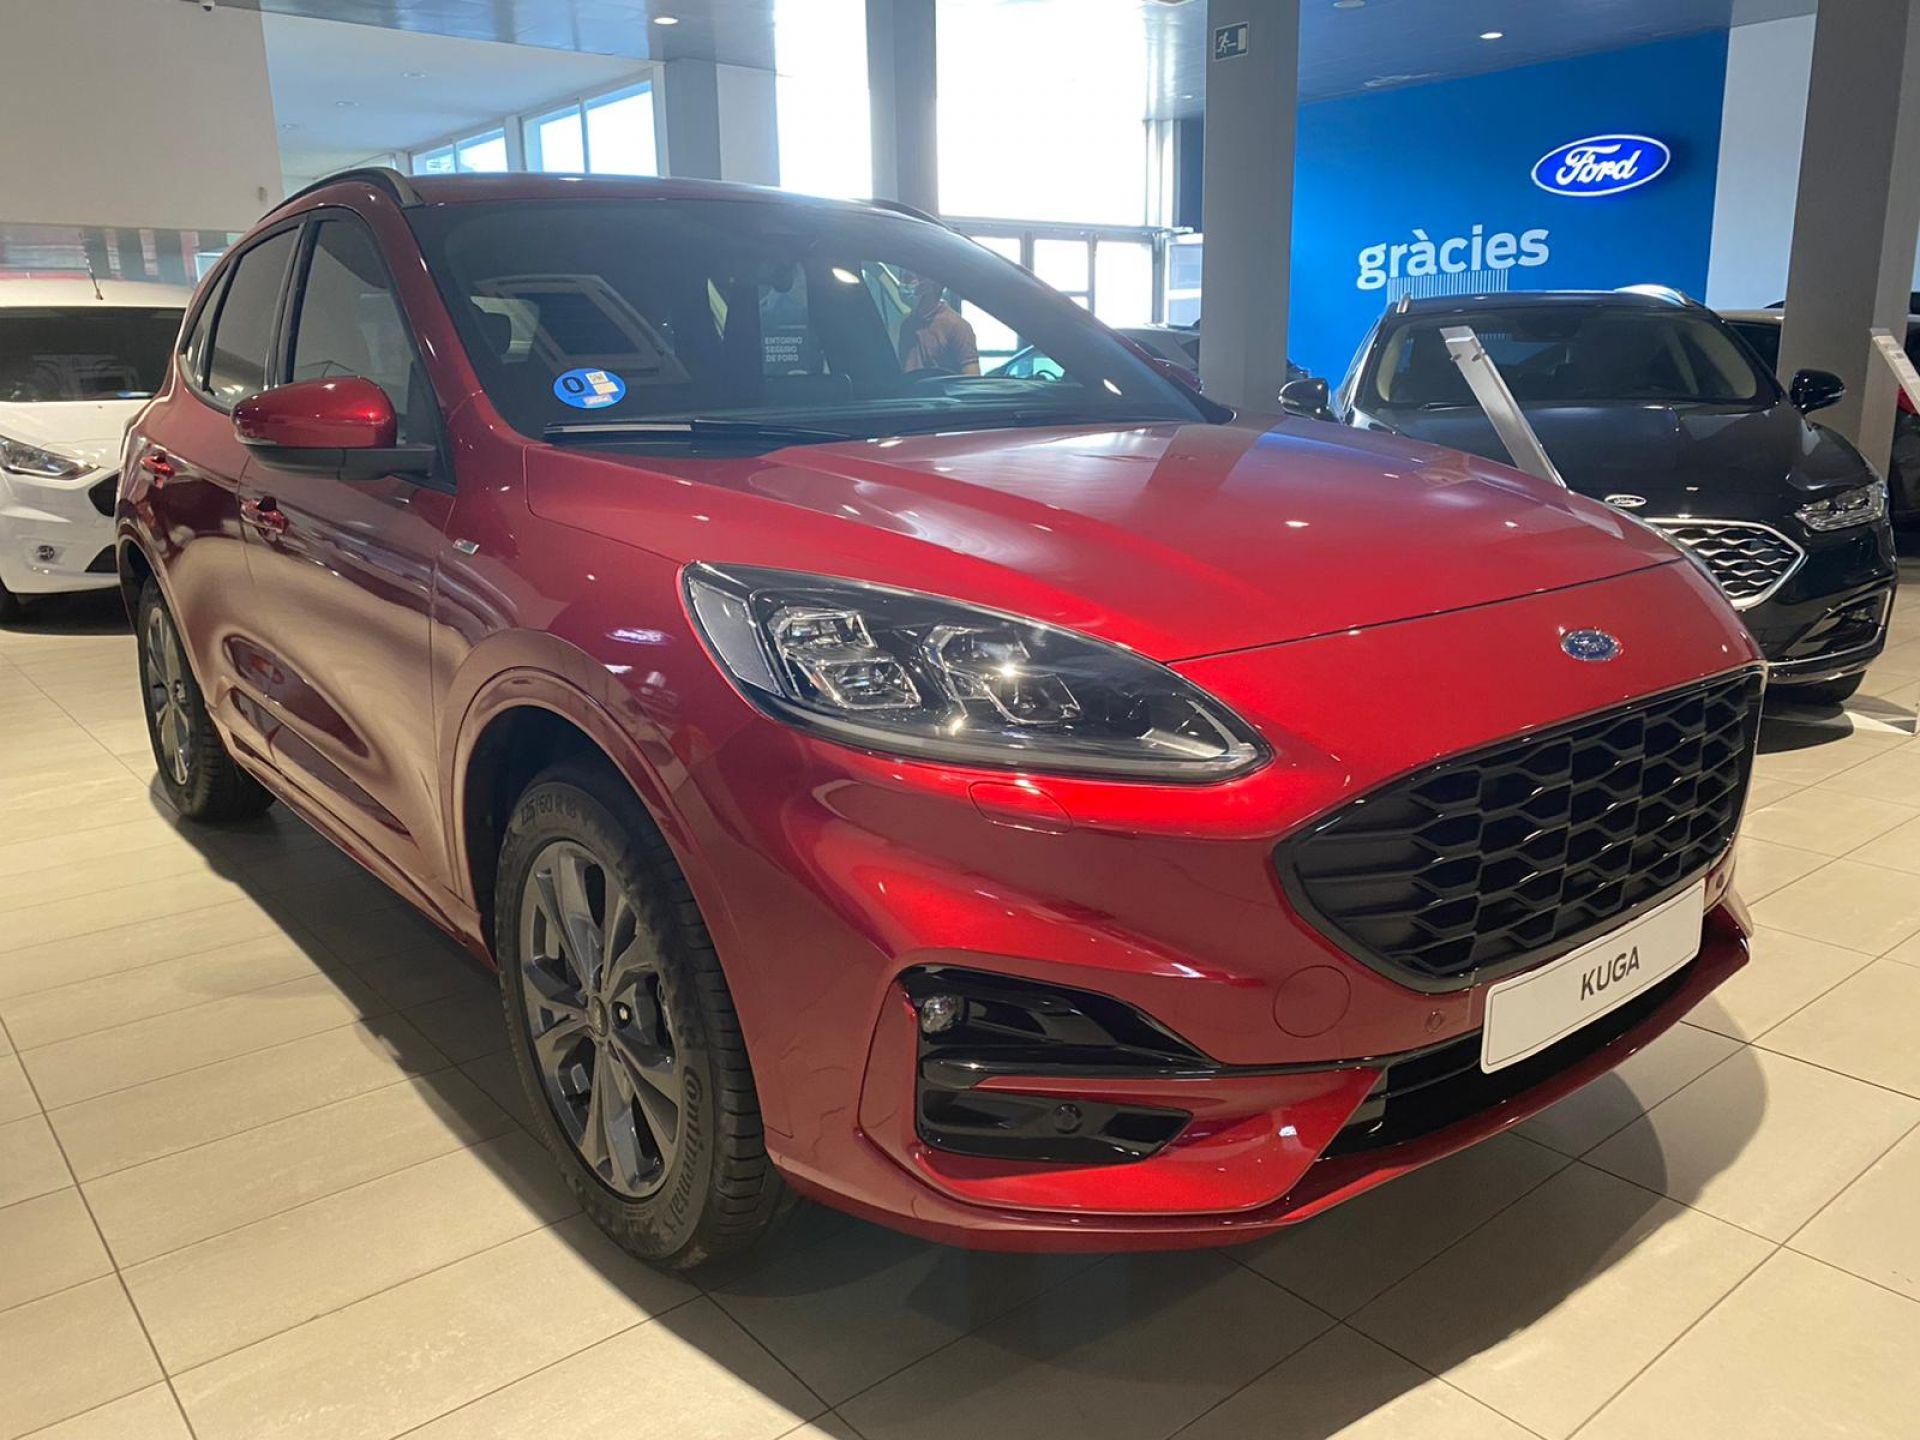 Ford Kuga ST-Line X 2.5 Duratec PHEV 165kW Auto 2020 8000 Rojo Lucid  (metalizada) de Ocasión (4086)